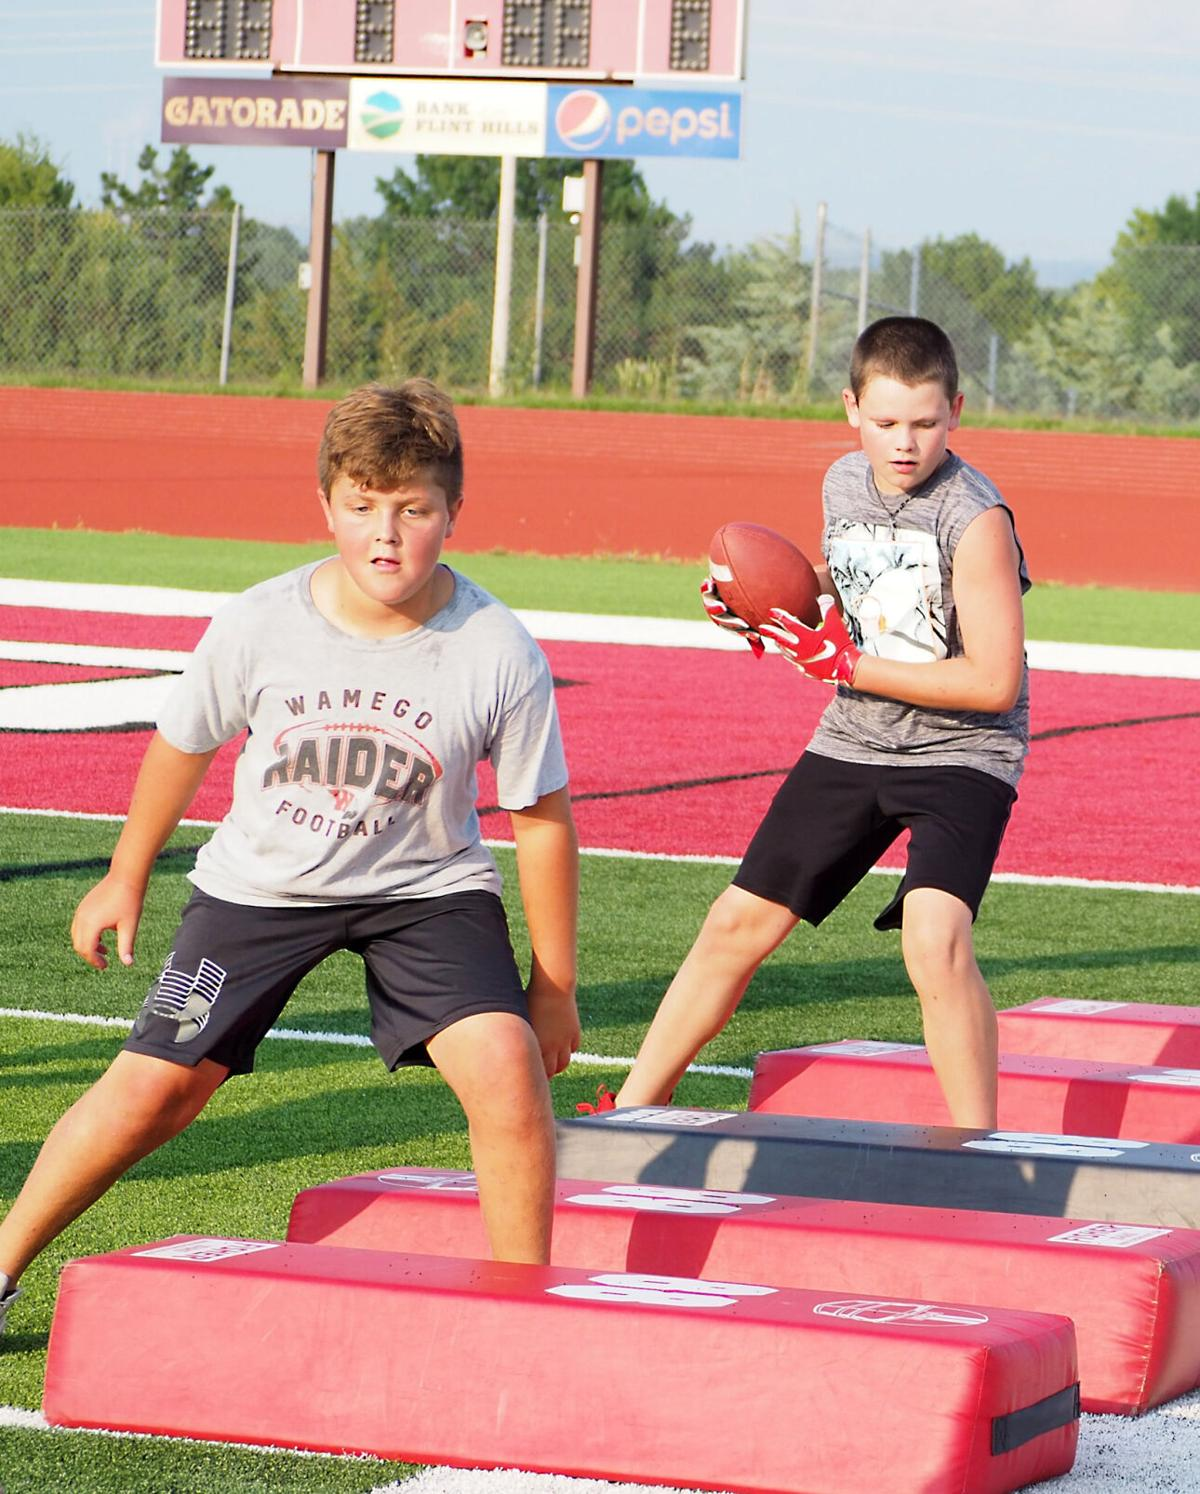 Junior Raider Football Camp - July 19